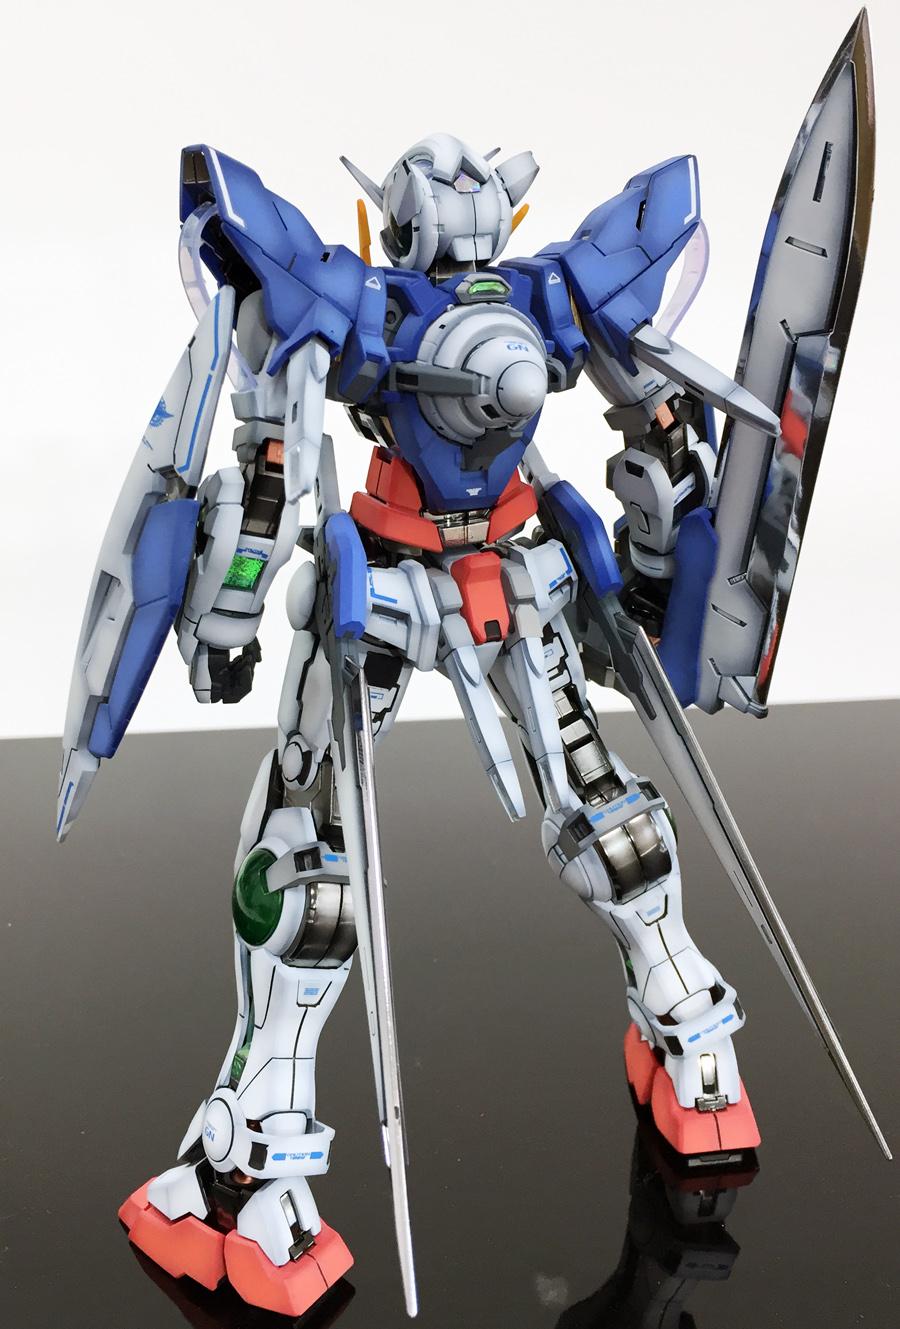 MG 1/100 Gundam Exia - Customized Build